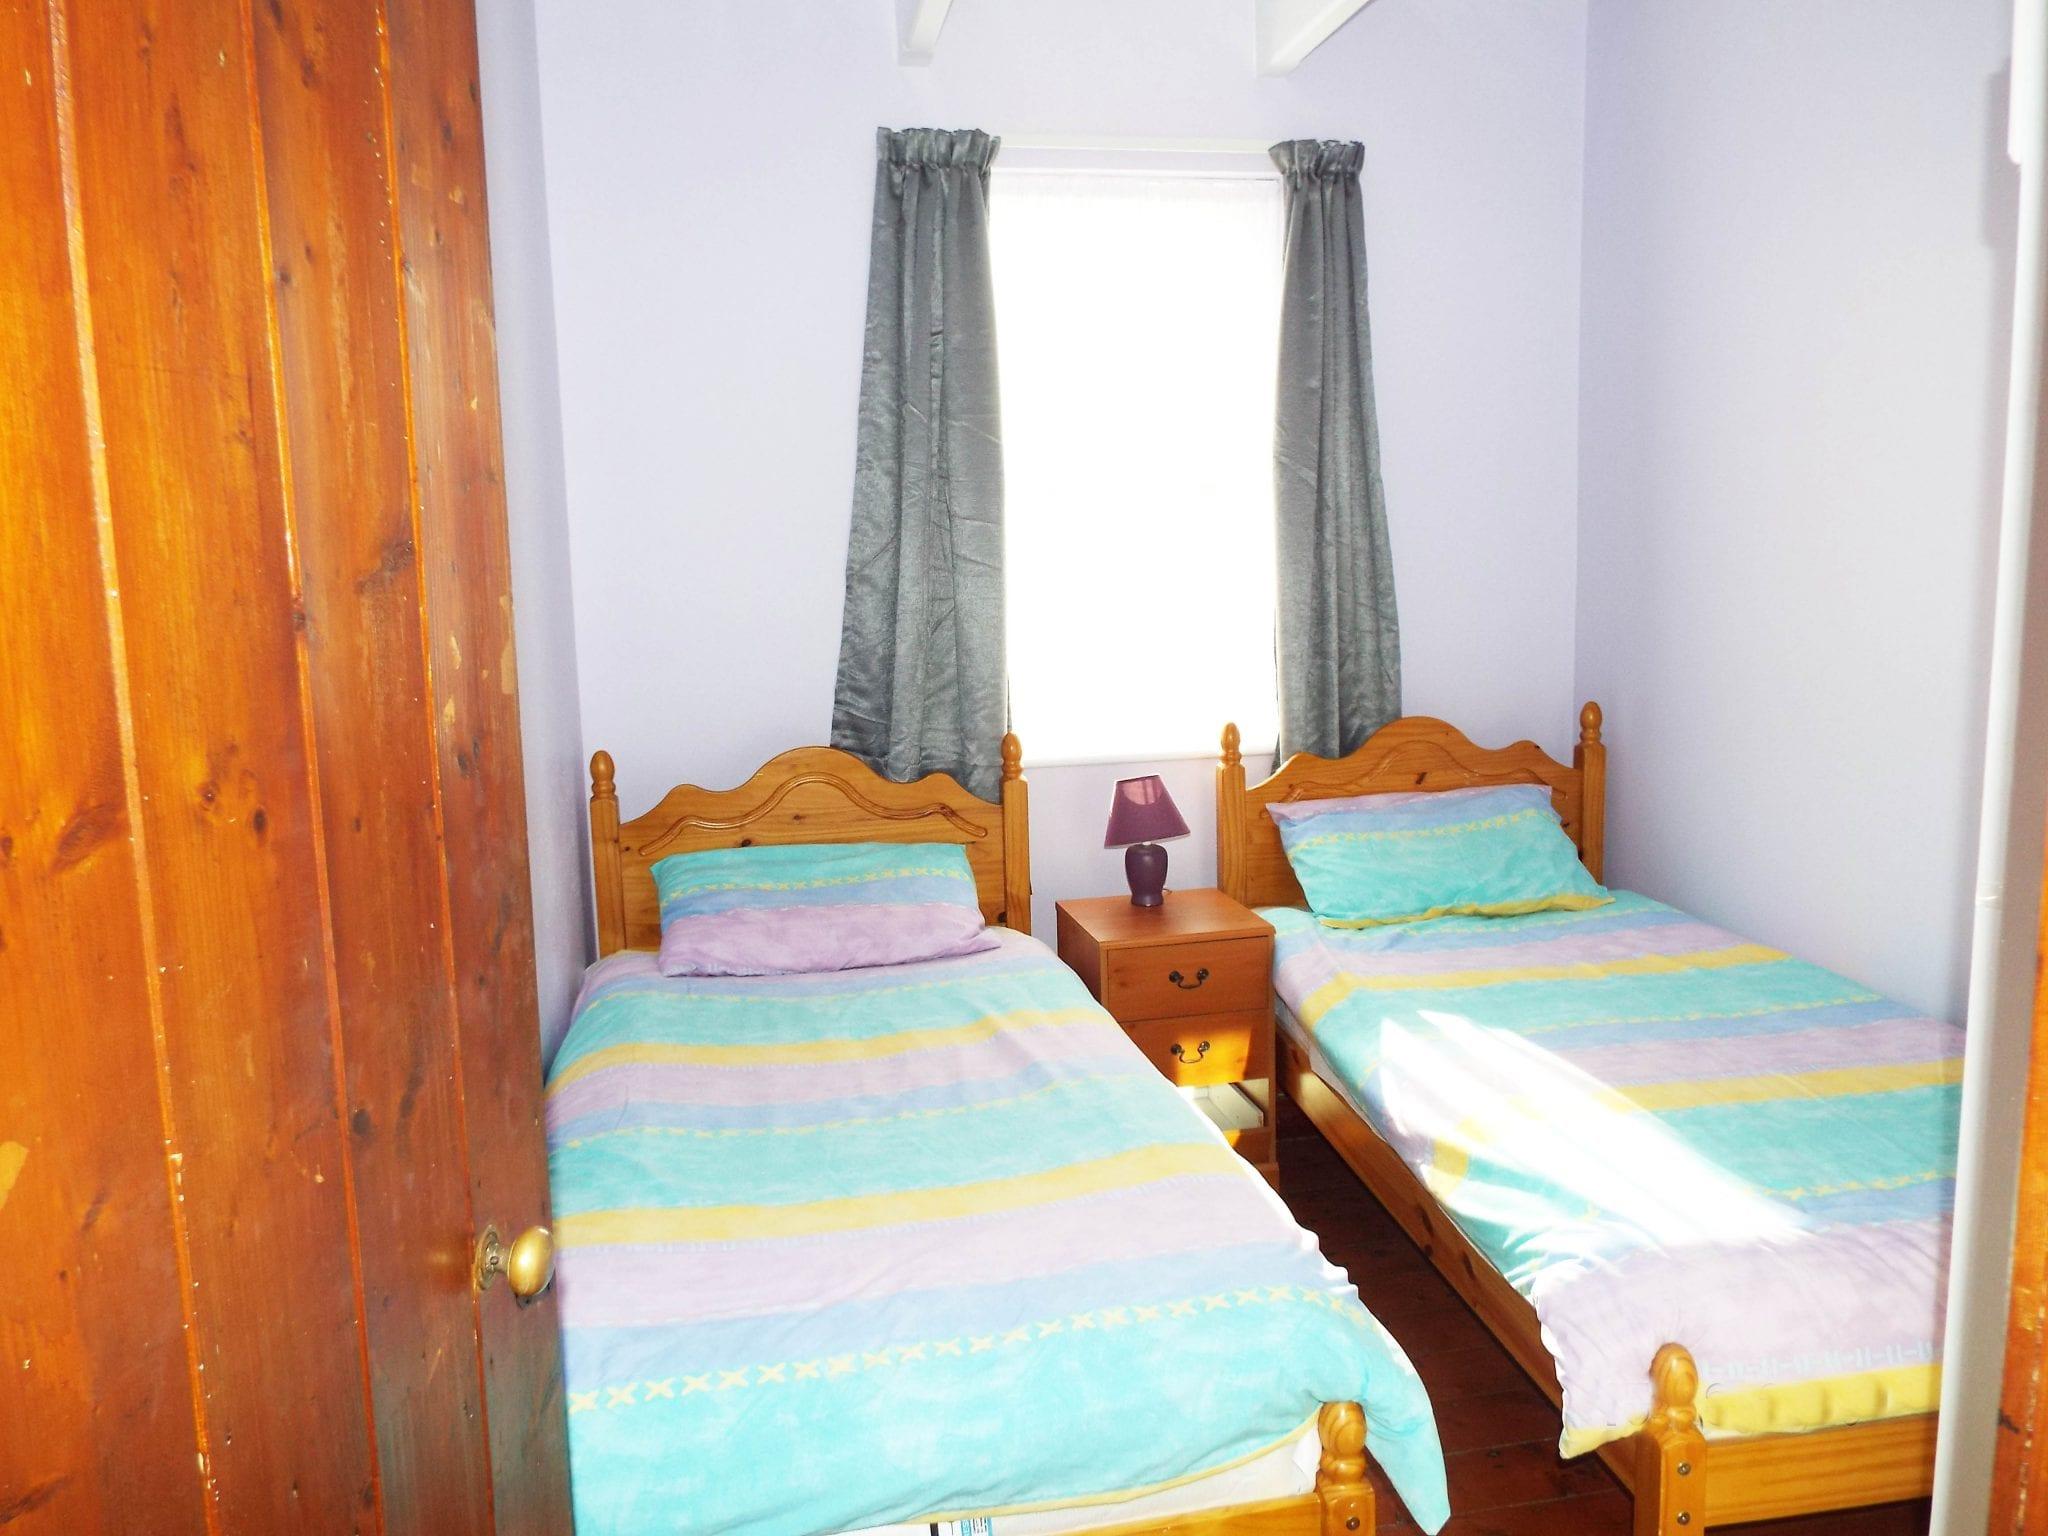 15 - bed 3 light & smudge